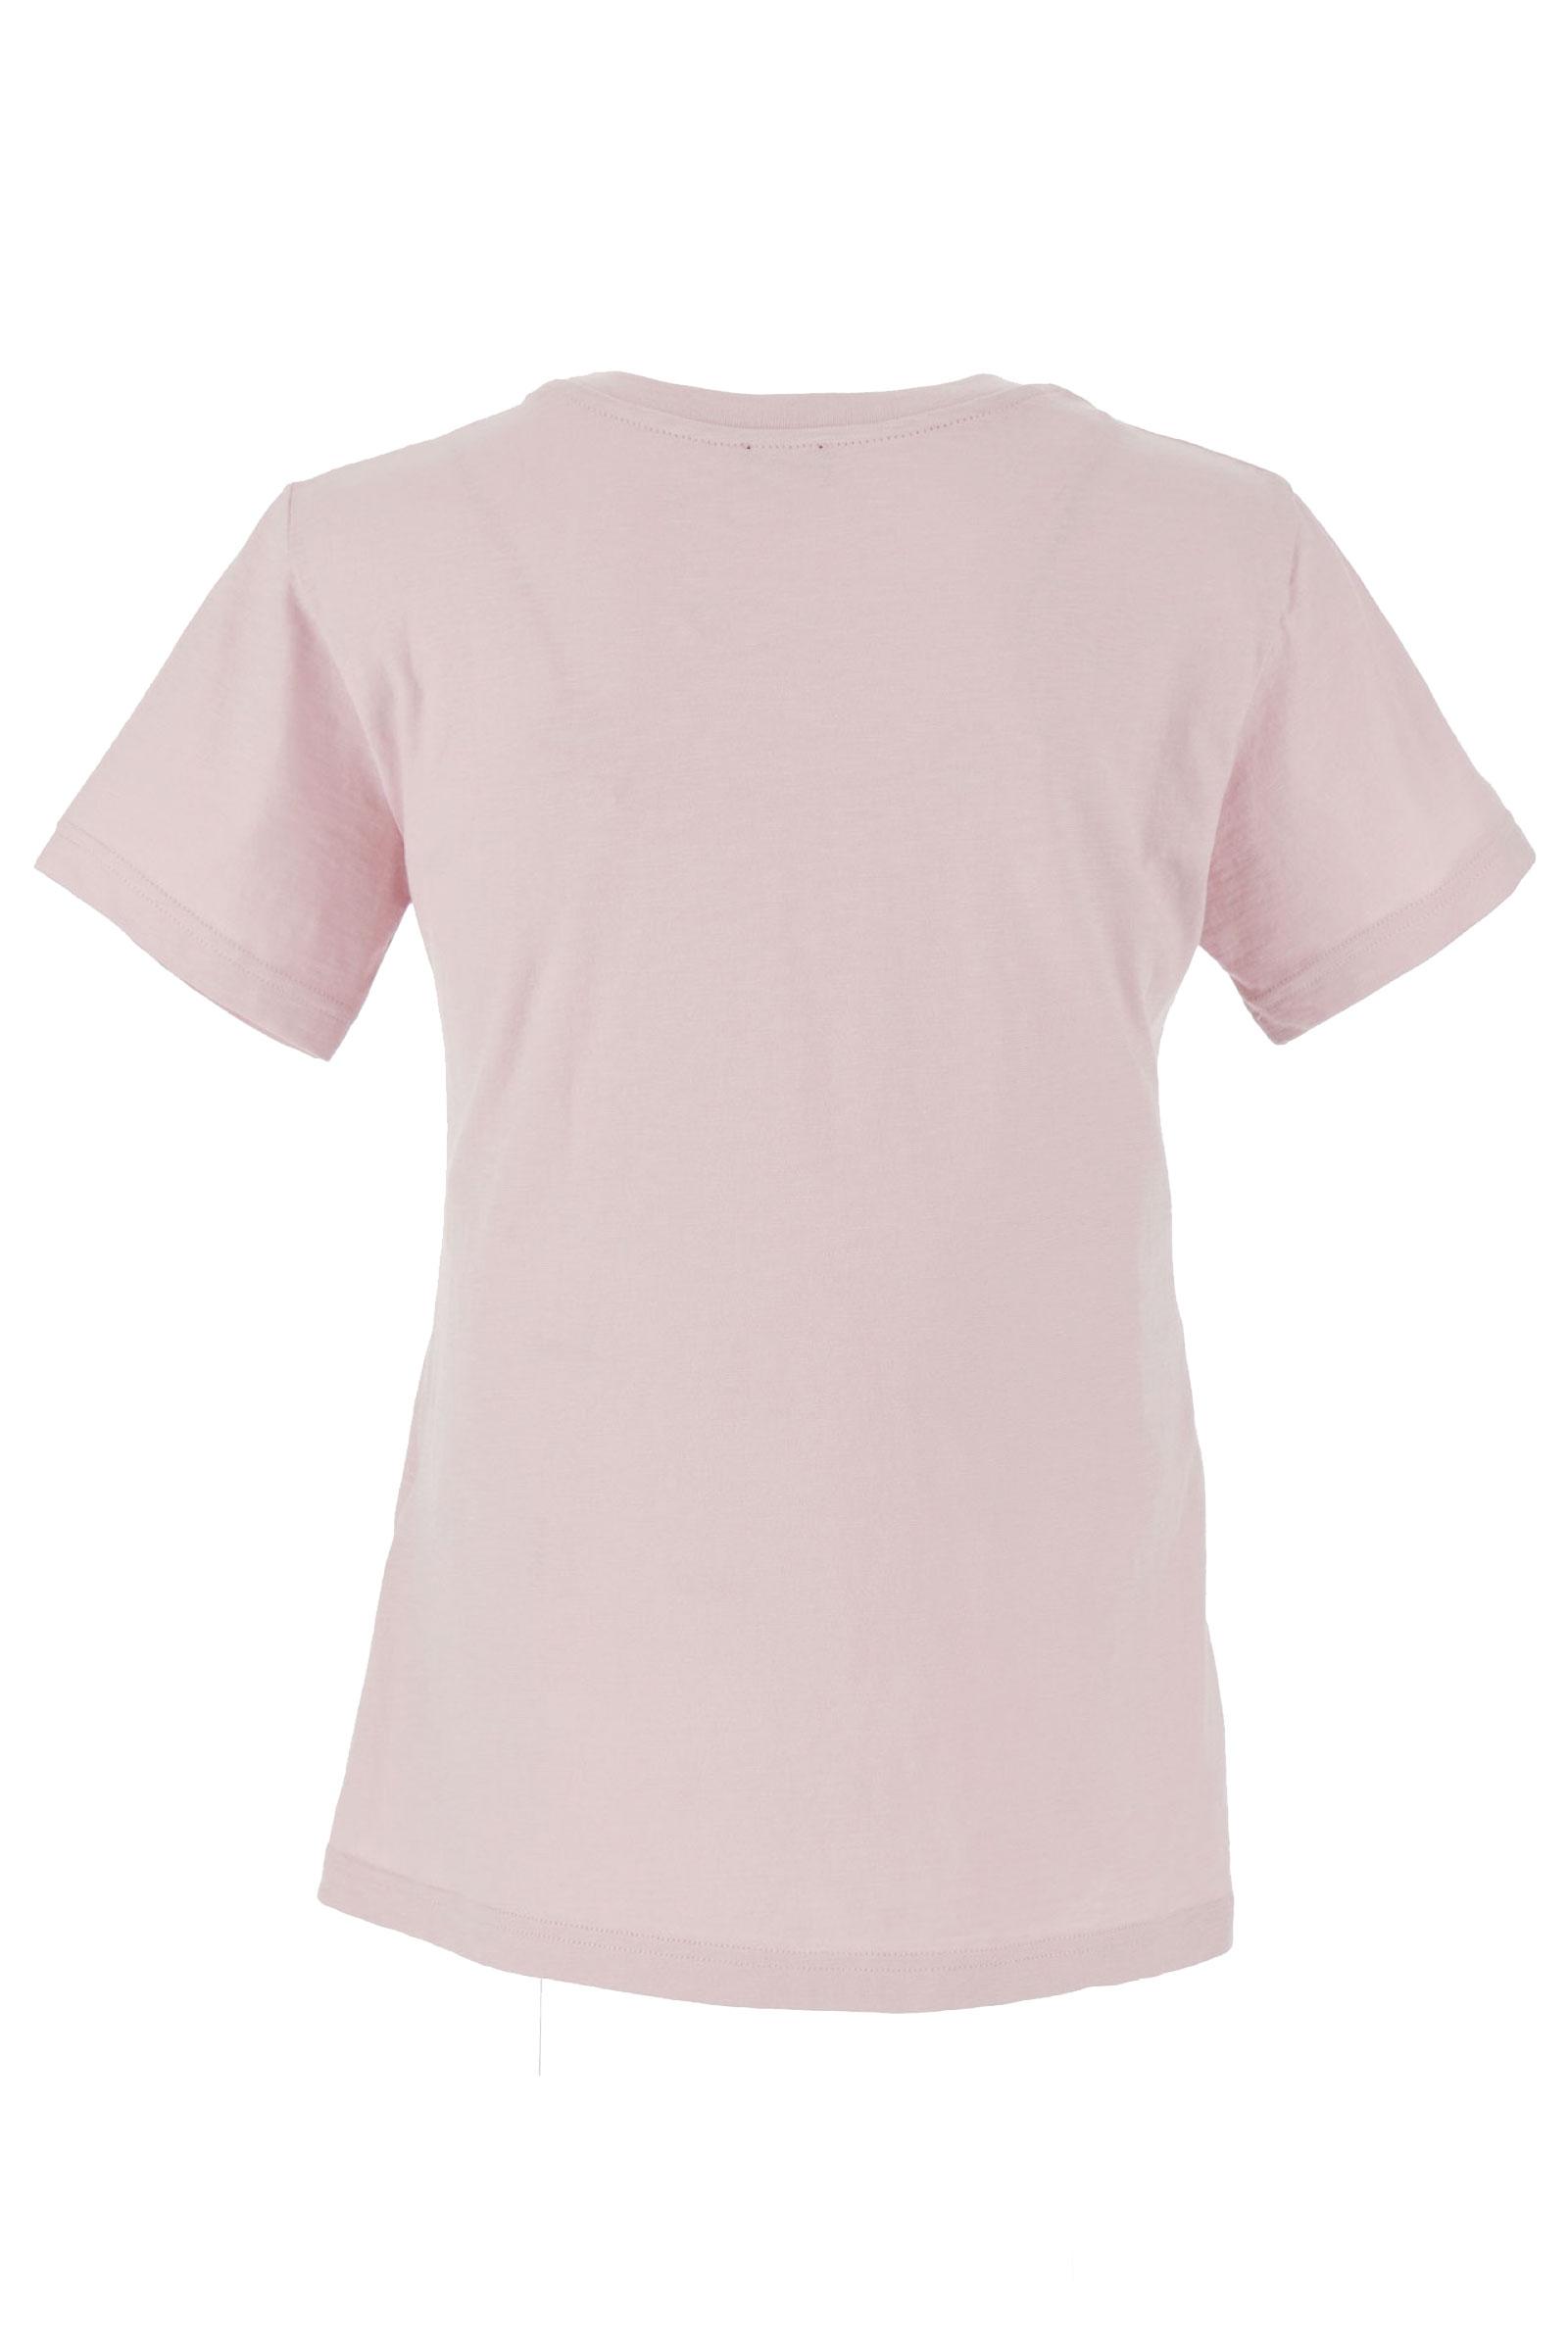 EMME MARELLA T-Shirt Modello RIDE EMME MARELLA | T-Shirt | 59710514000001